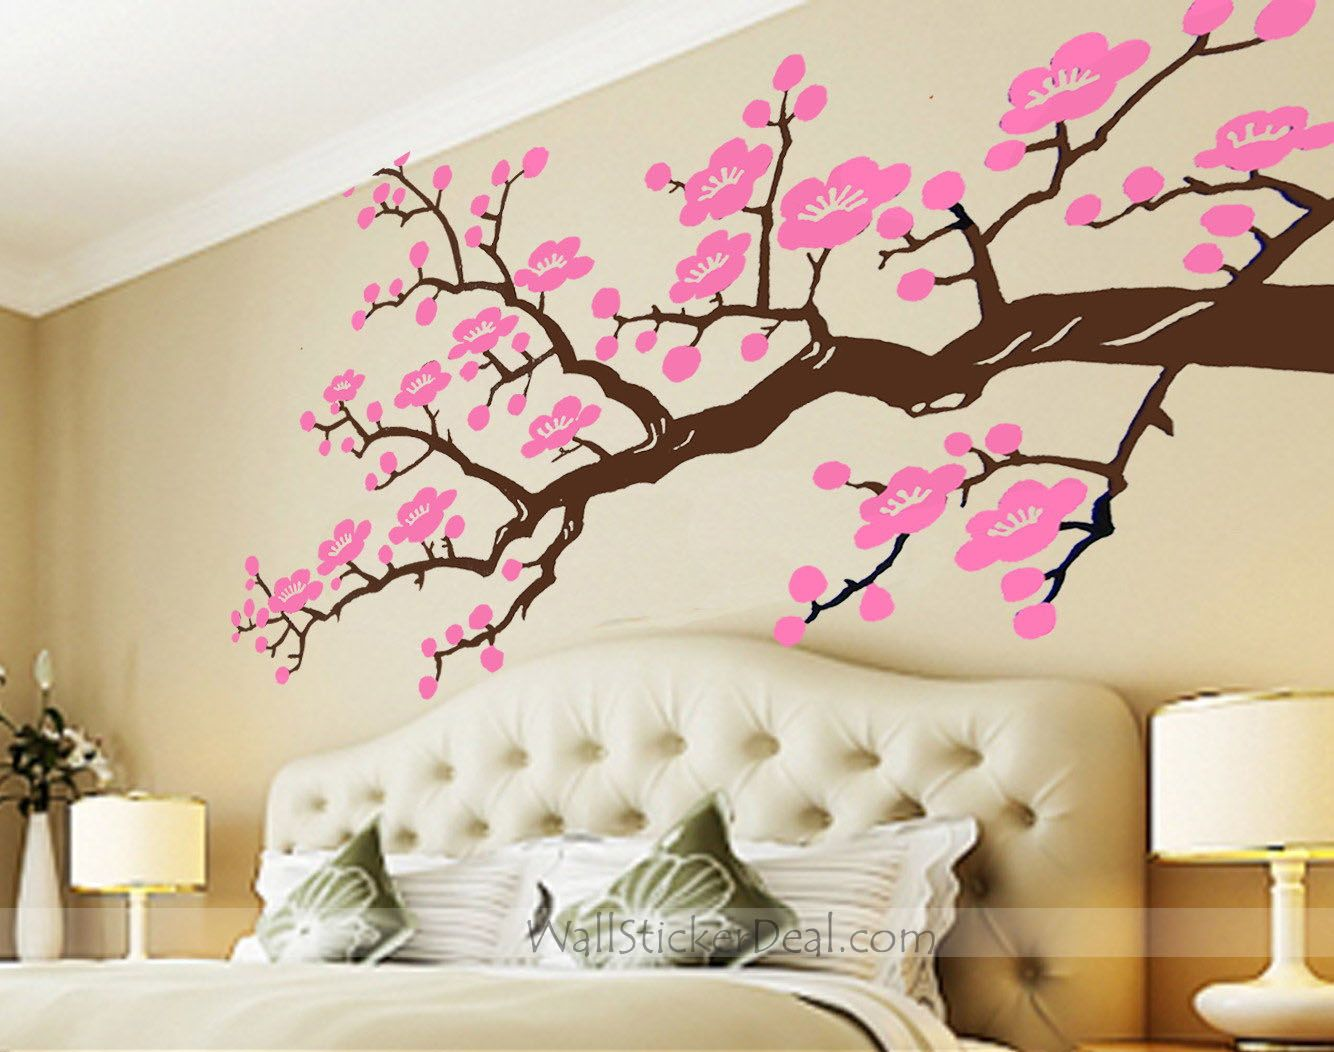 Cherry Blossom Branches Wall Stickers Wallstickerdeal Com Flower Wall Decals Simple Wall Decor Ikea Wall Art